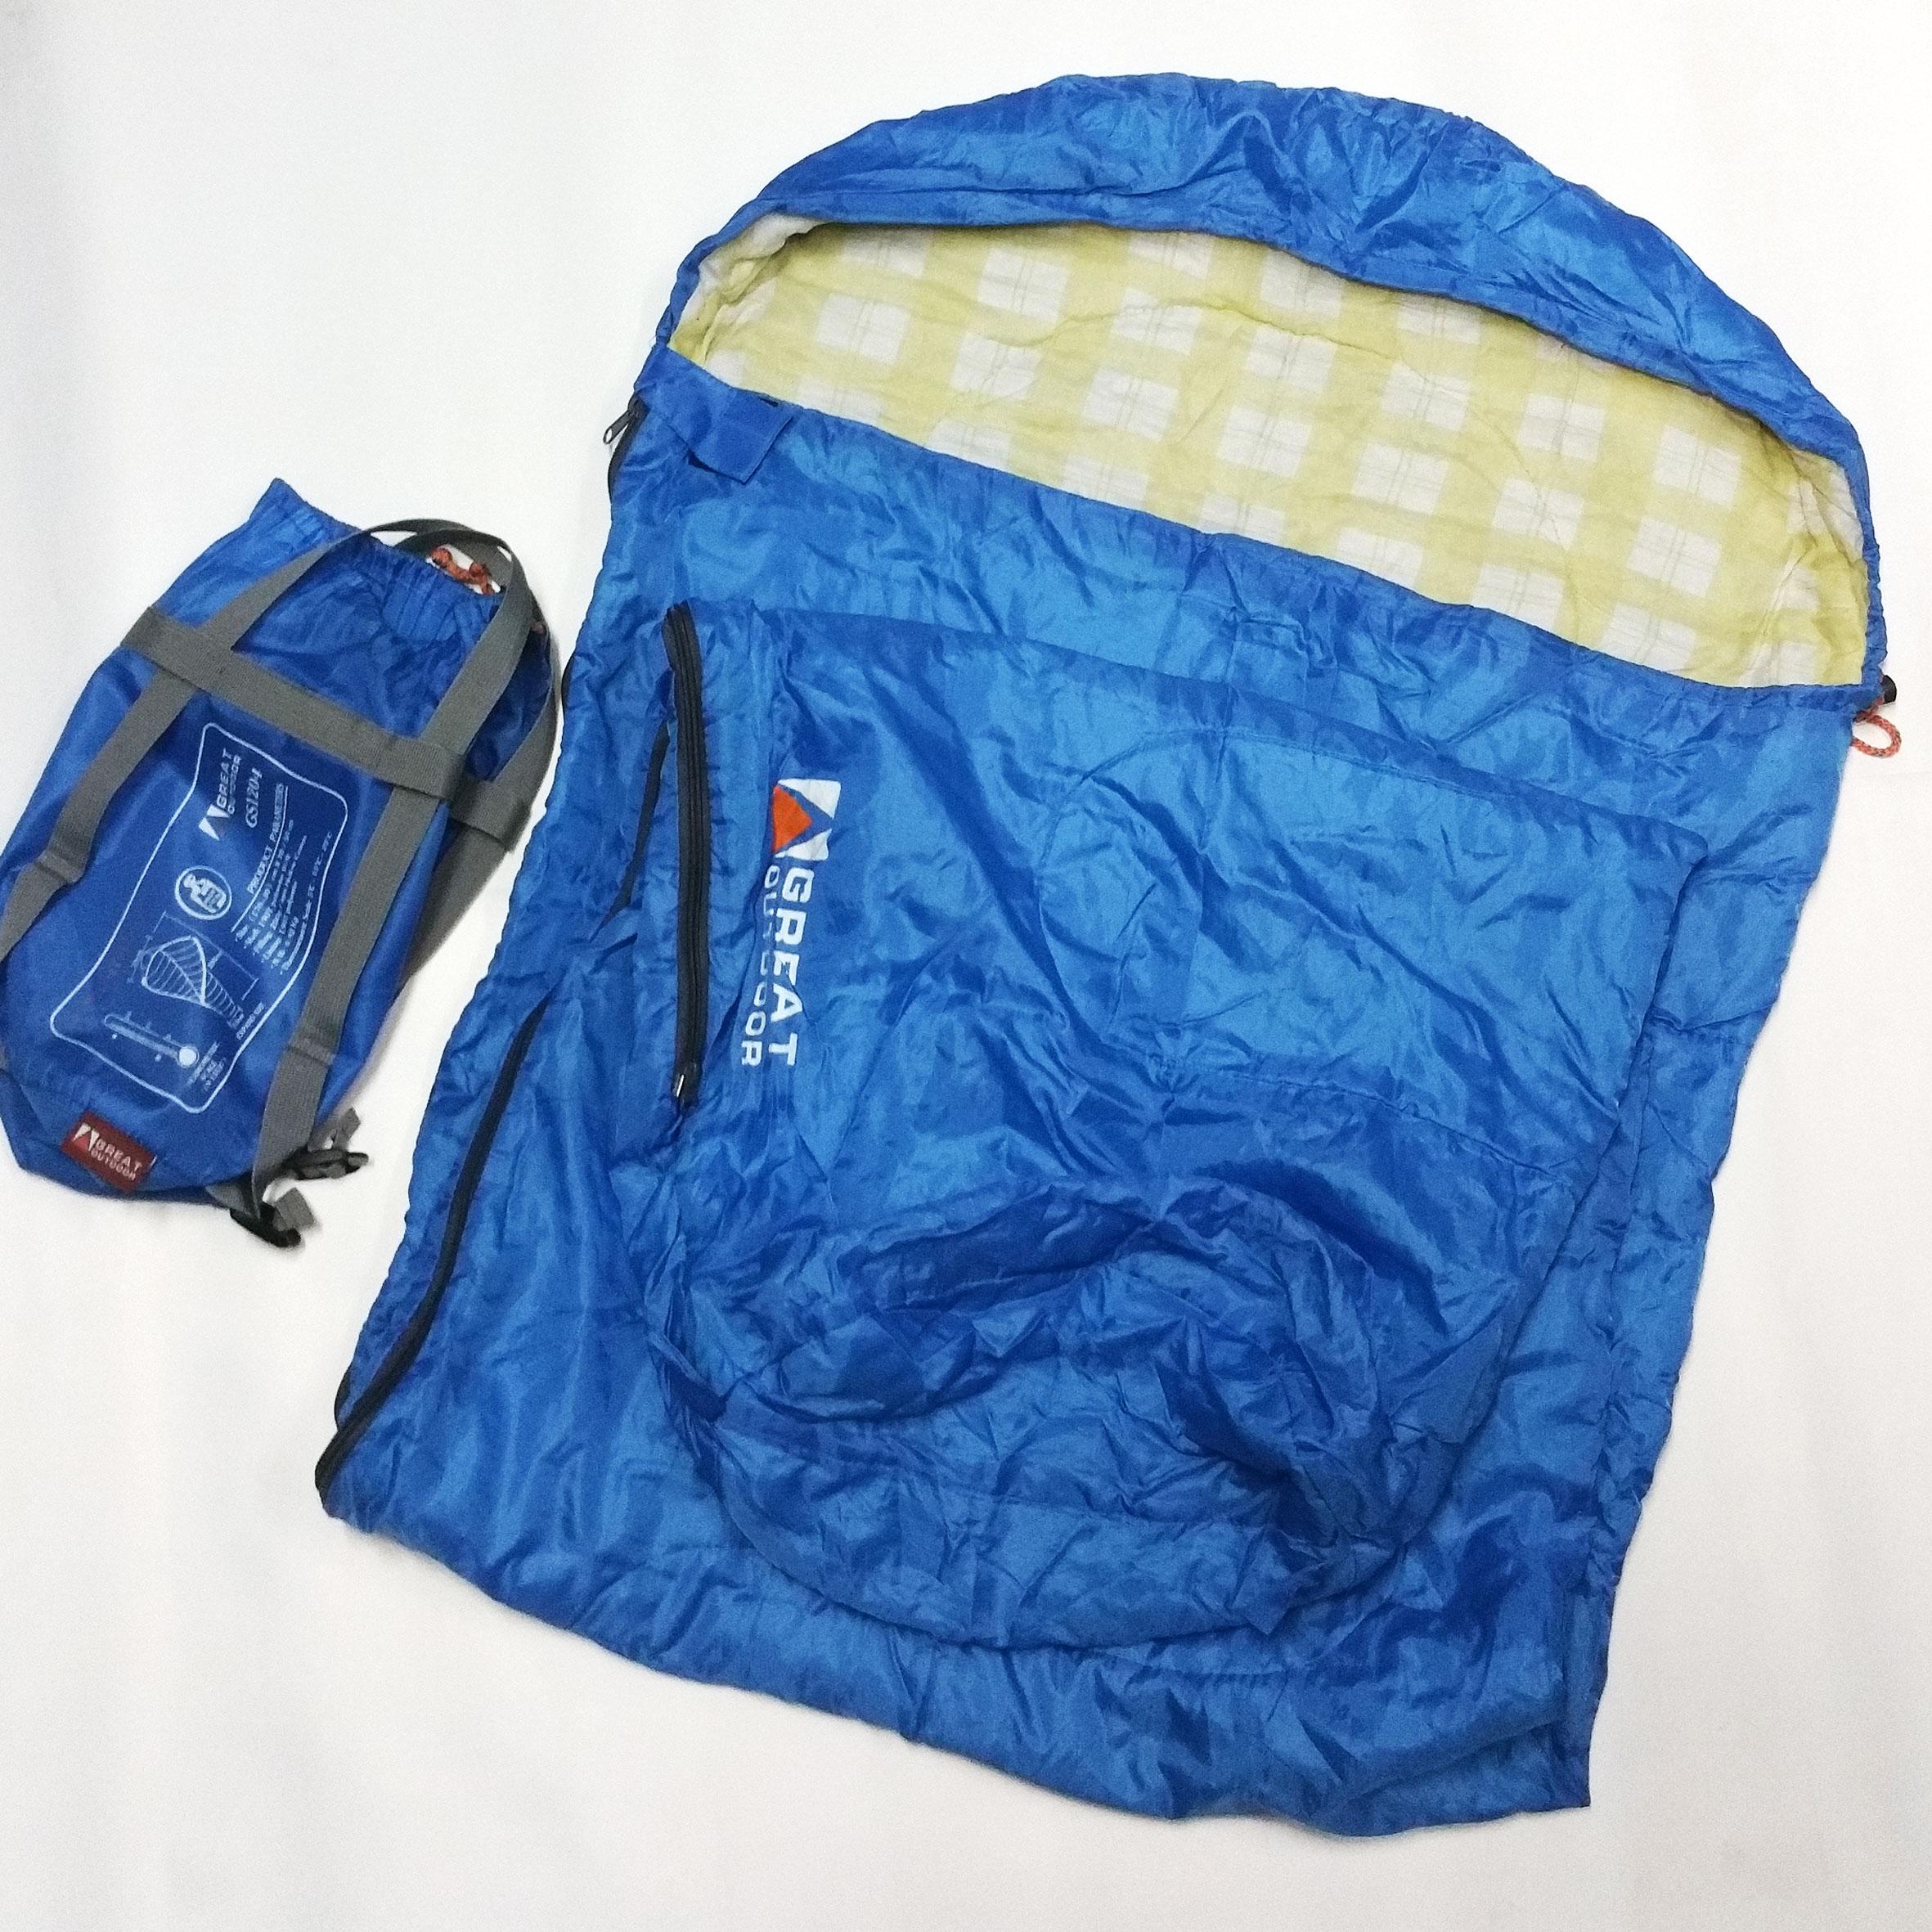 Sleeping Bag - Great Outdoor